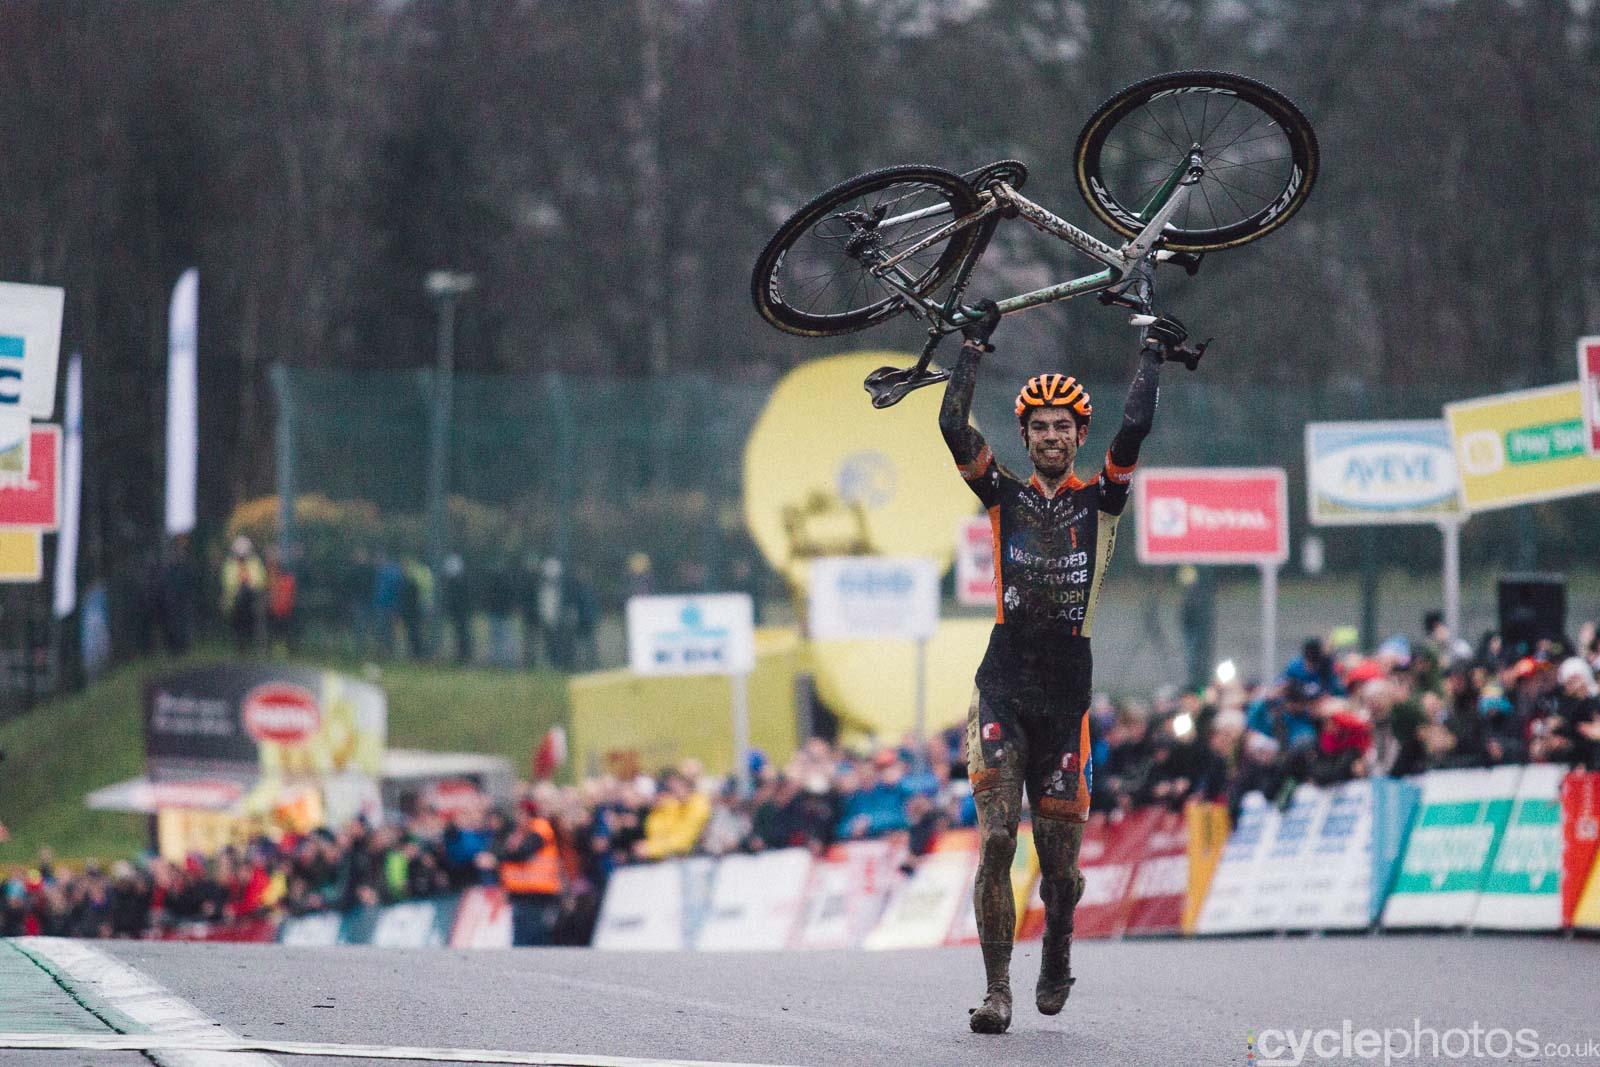 2015-cyclephotos-cyclocross-spa-160338-wout-van-aert